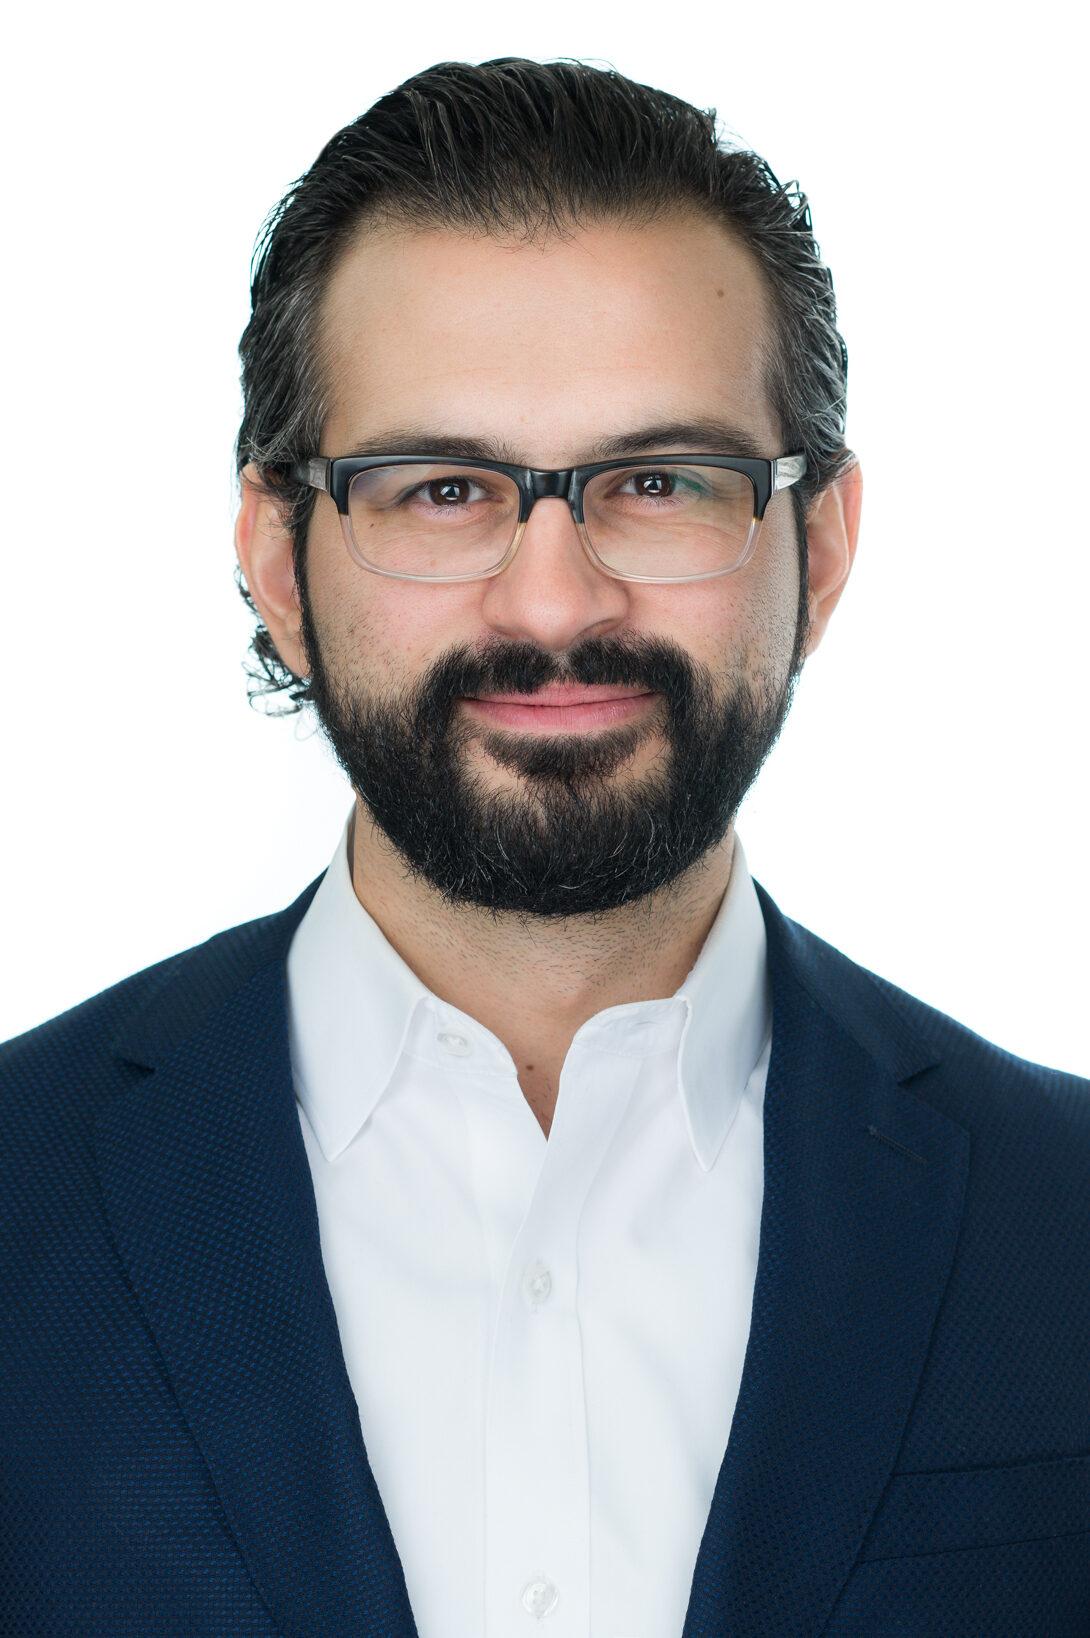 Austin Bockwinkel (Moderator)